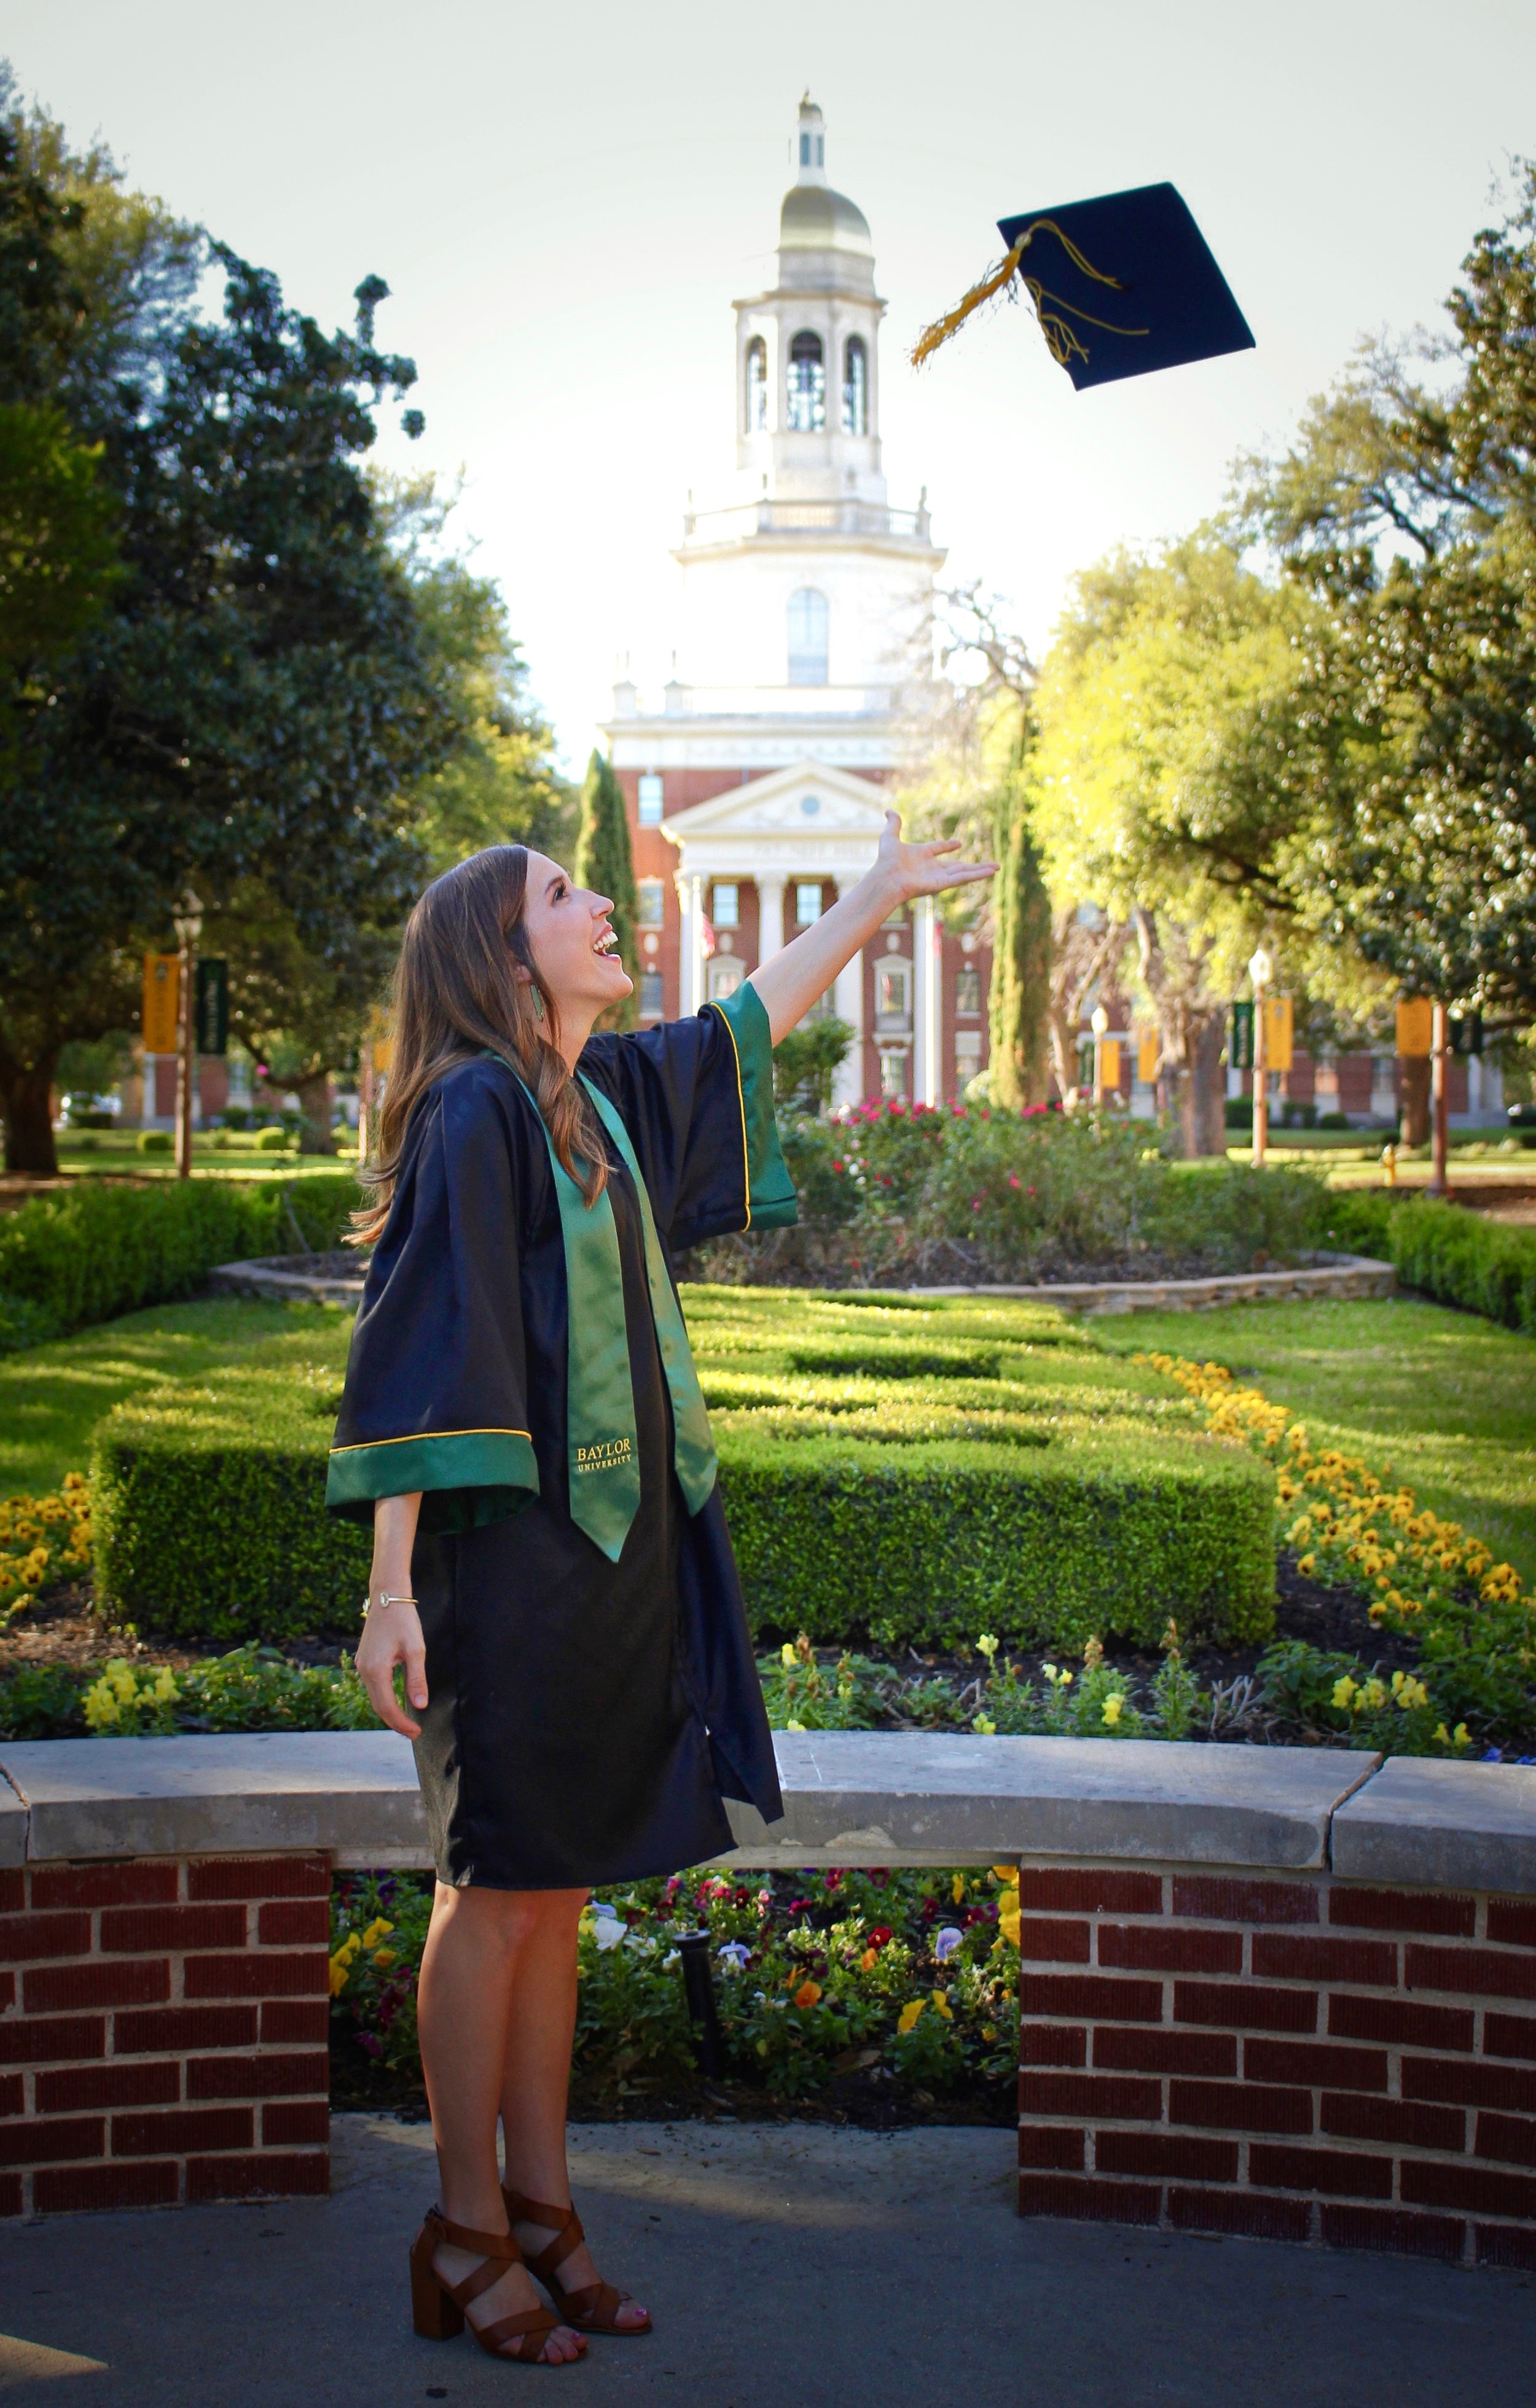 Hayley Hartwick last year at her graduation from Baylor University. (Kerri Hartwick Doughty)